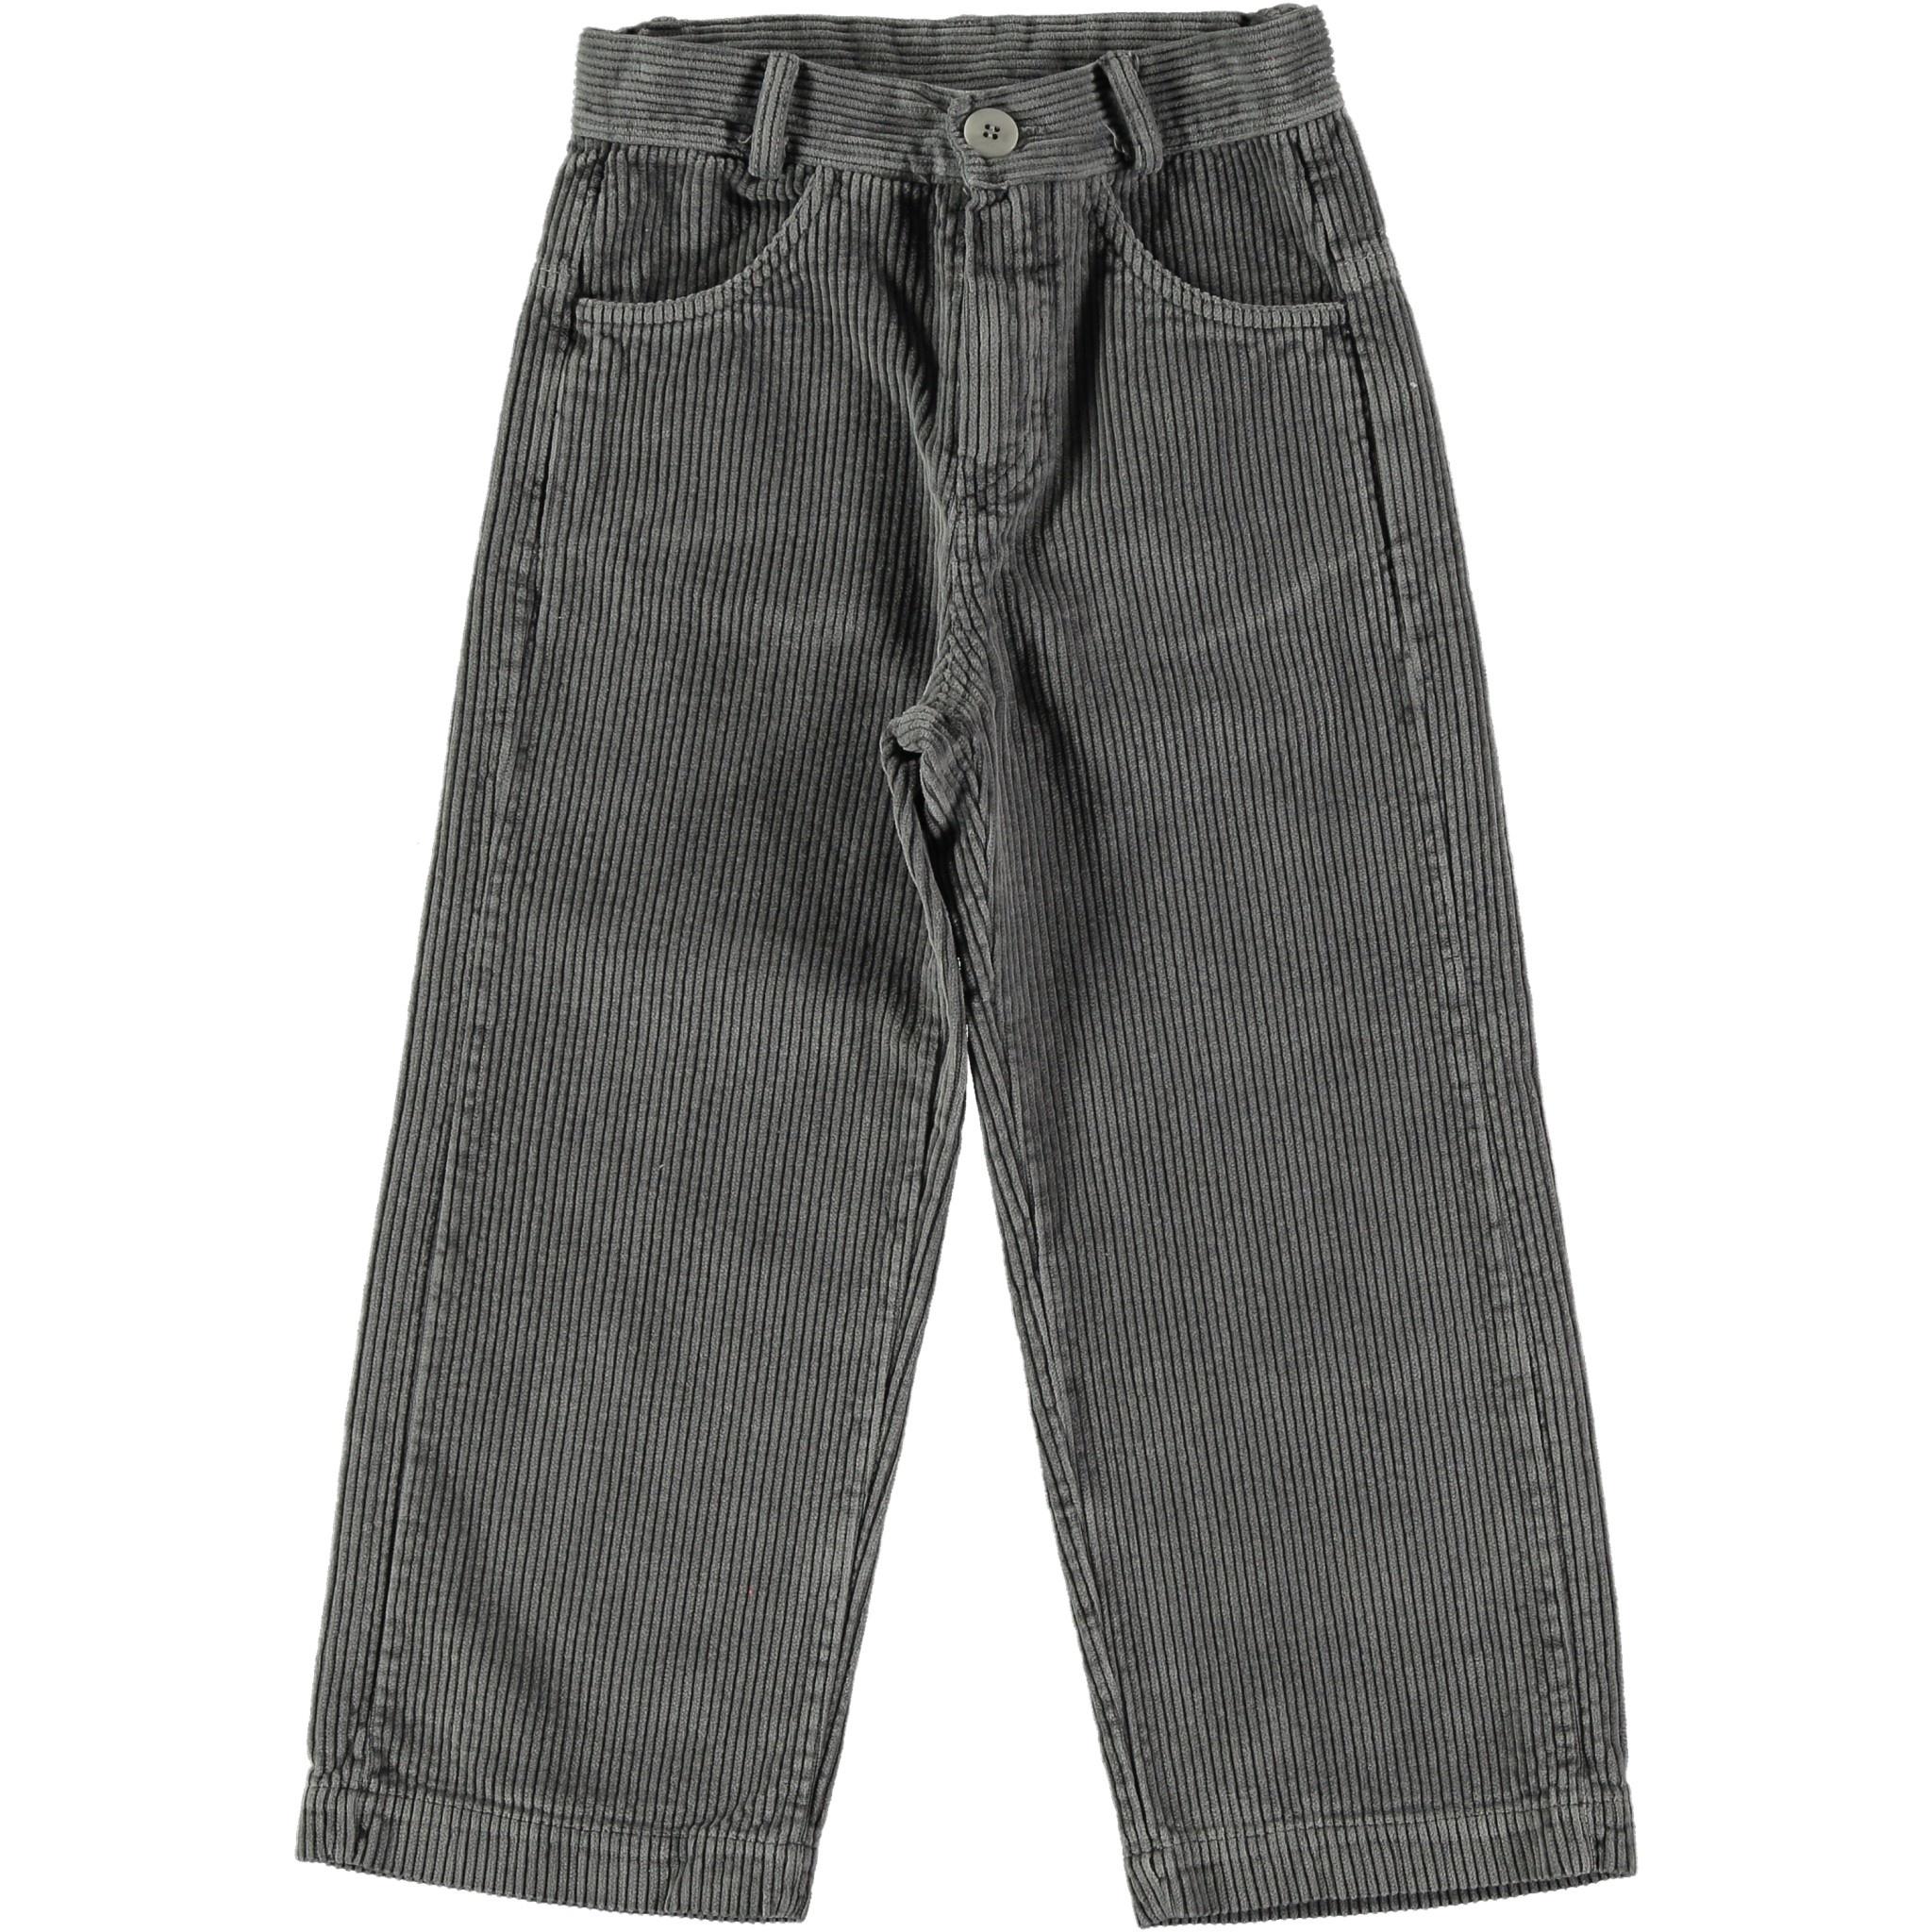 Corduroy trouser everyday good night baby-1